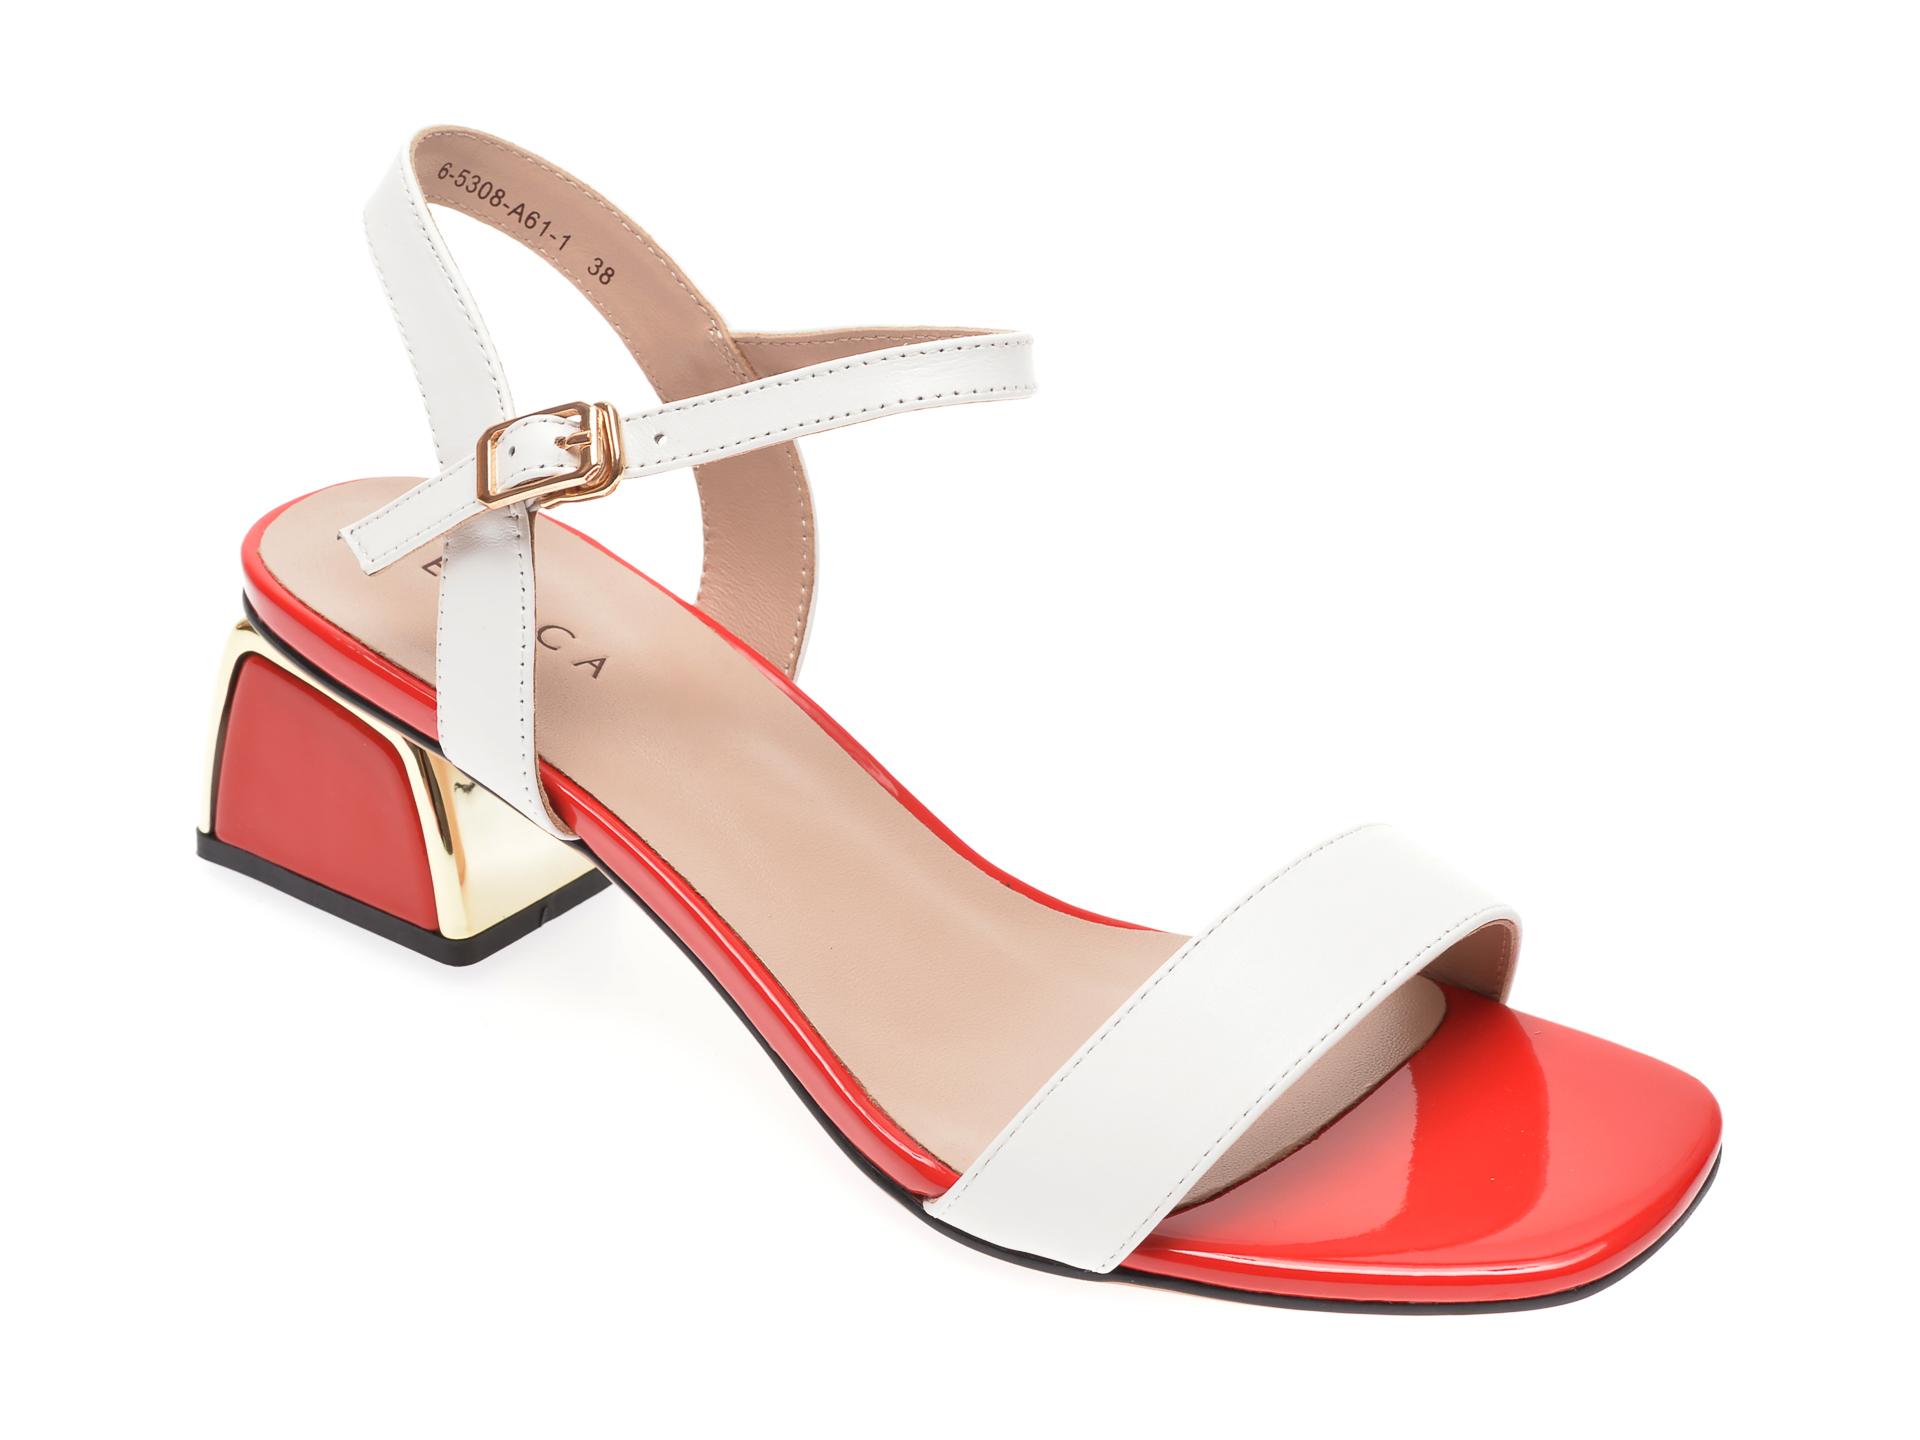 Sandale EPICA albe, 65308A6, din piele naturala New